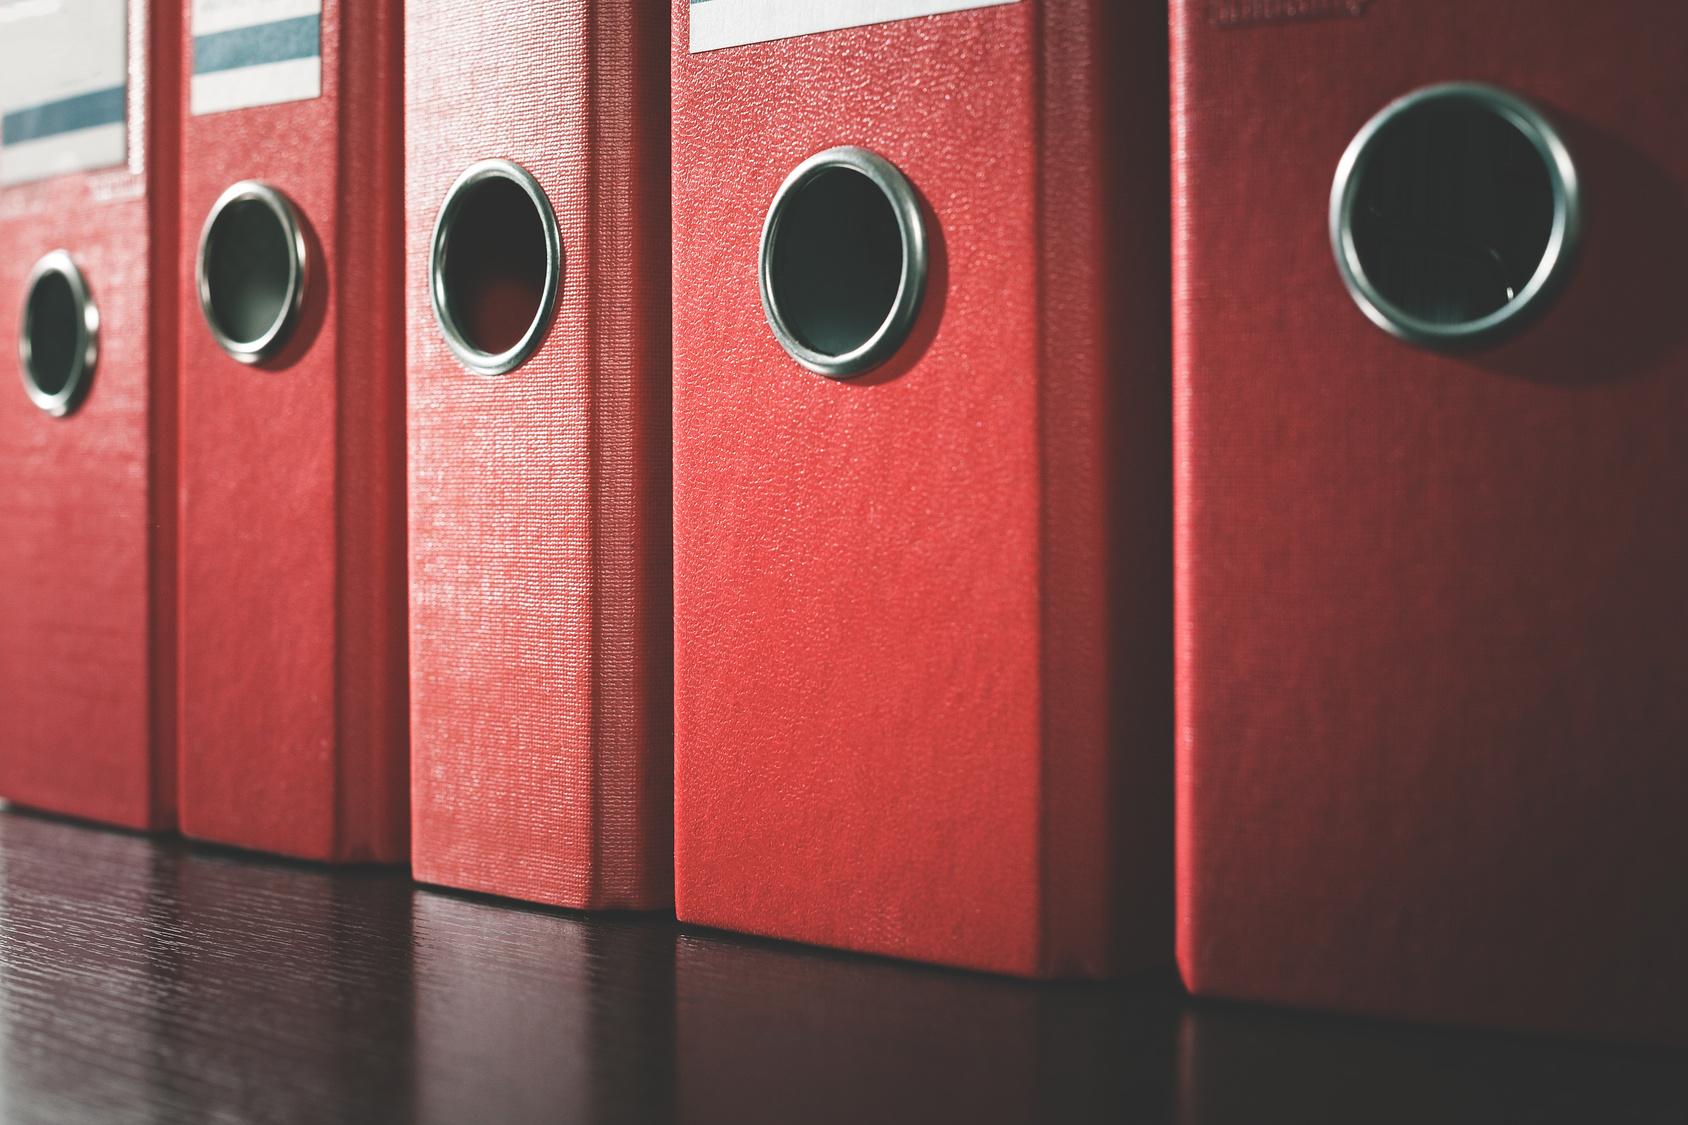 organize-your-job-search-organization-hacks